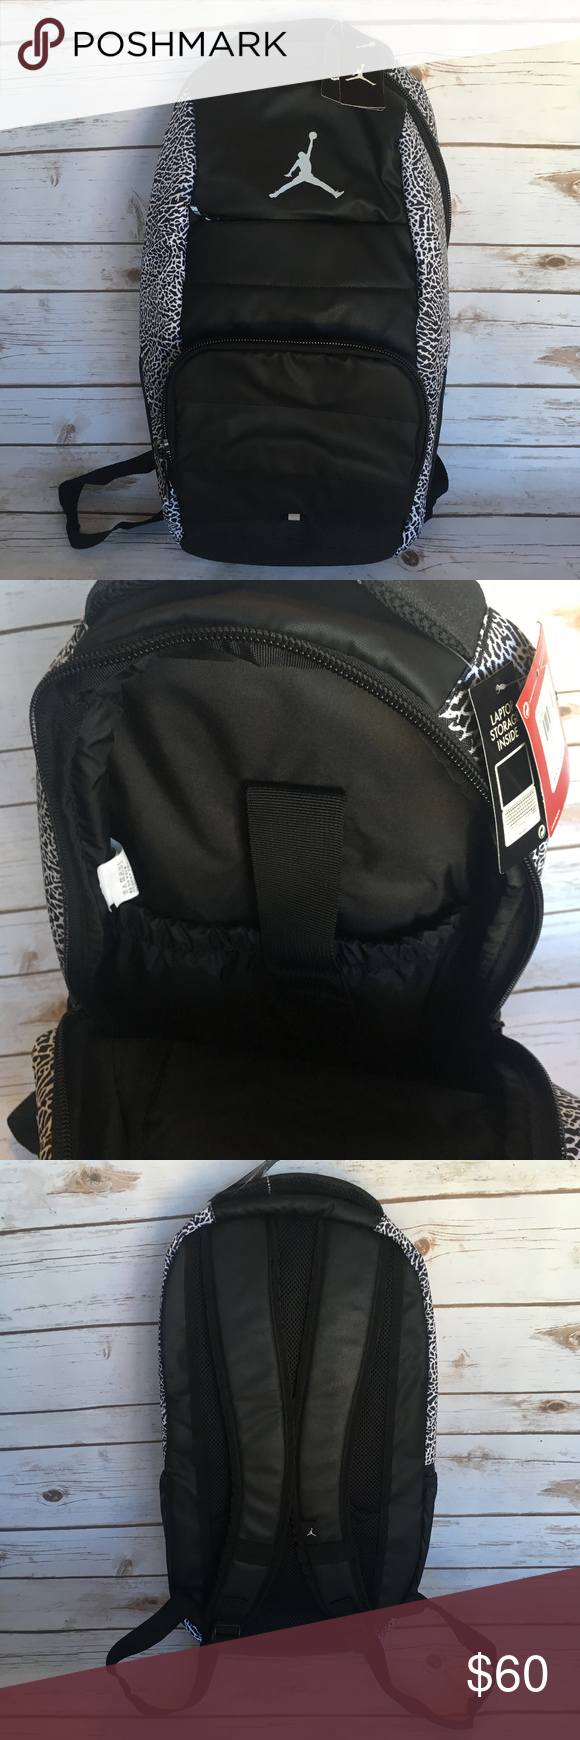 Nike Air Jordan All World Backpack Elephant print NWT (With